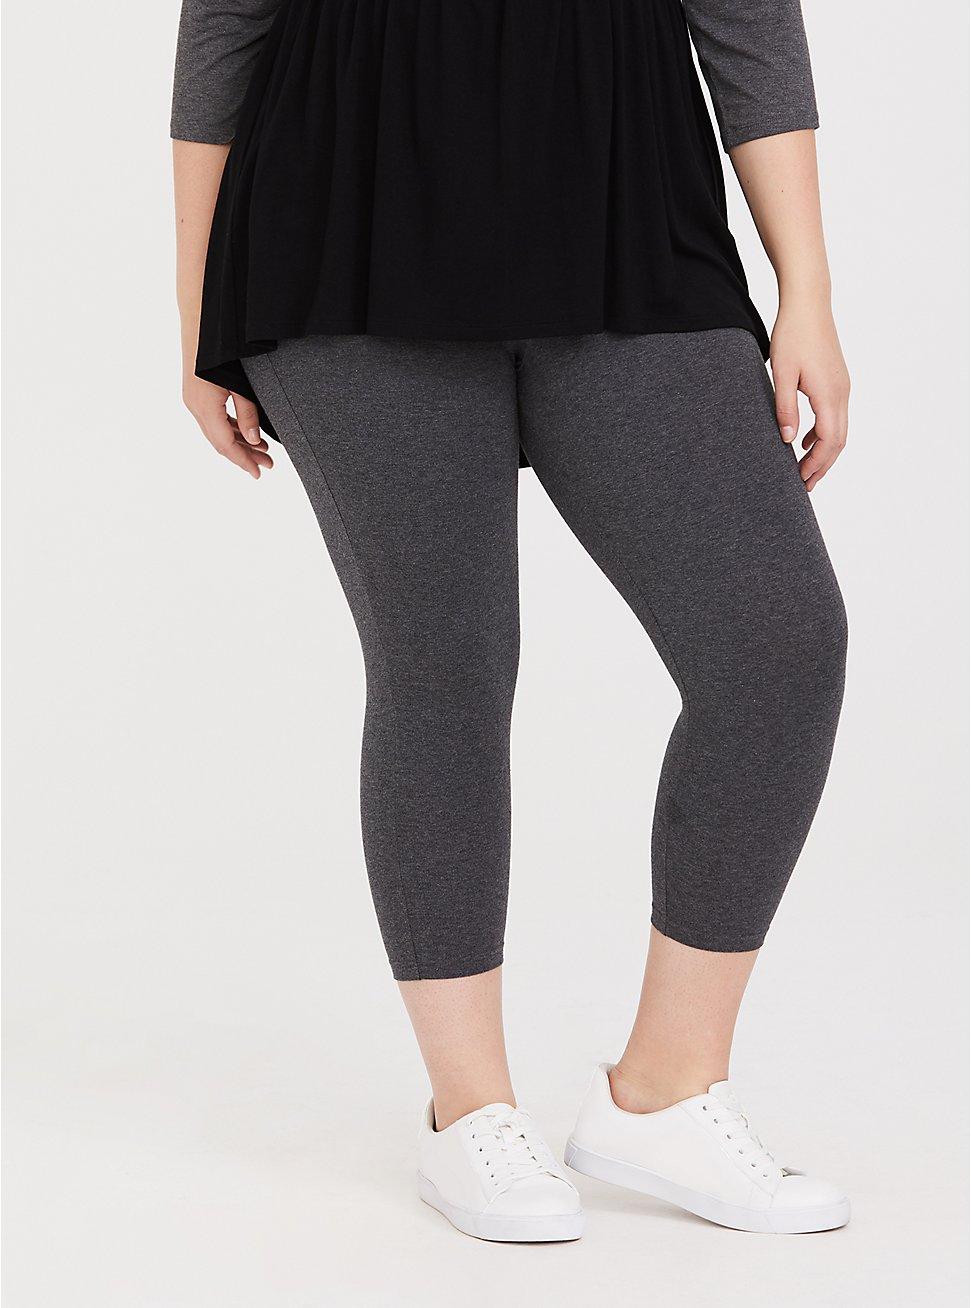 Capri Premium Legging - Marled Dark Grey Capri Legging, GRAY HTR, hi-res